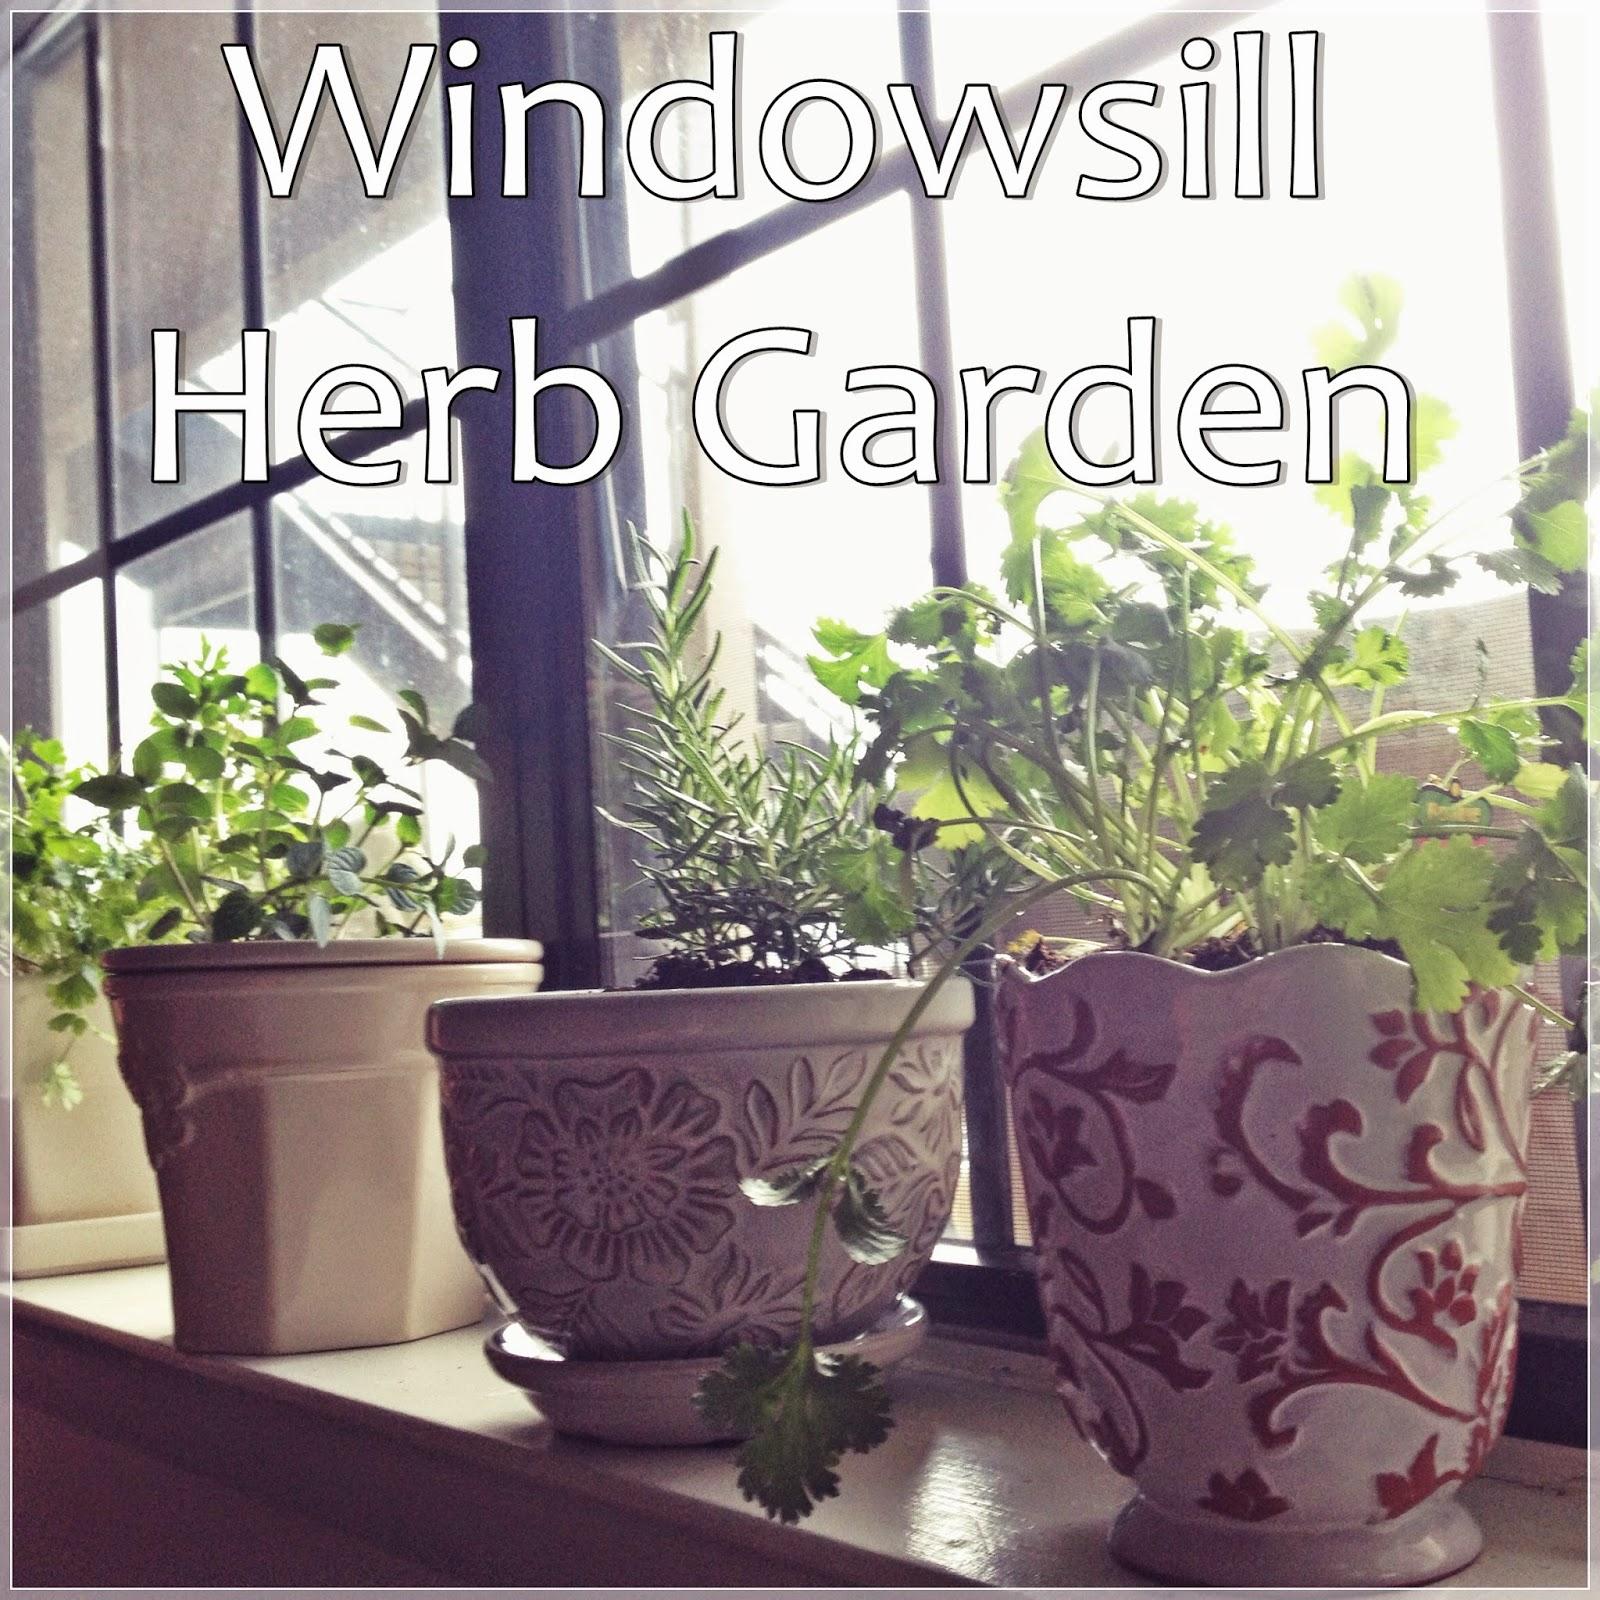 Windowsill Herb Planter: Let's Drink Coffee, Darling: Windowsill Herb Garden